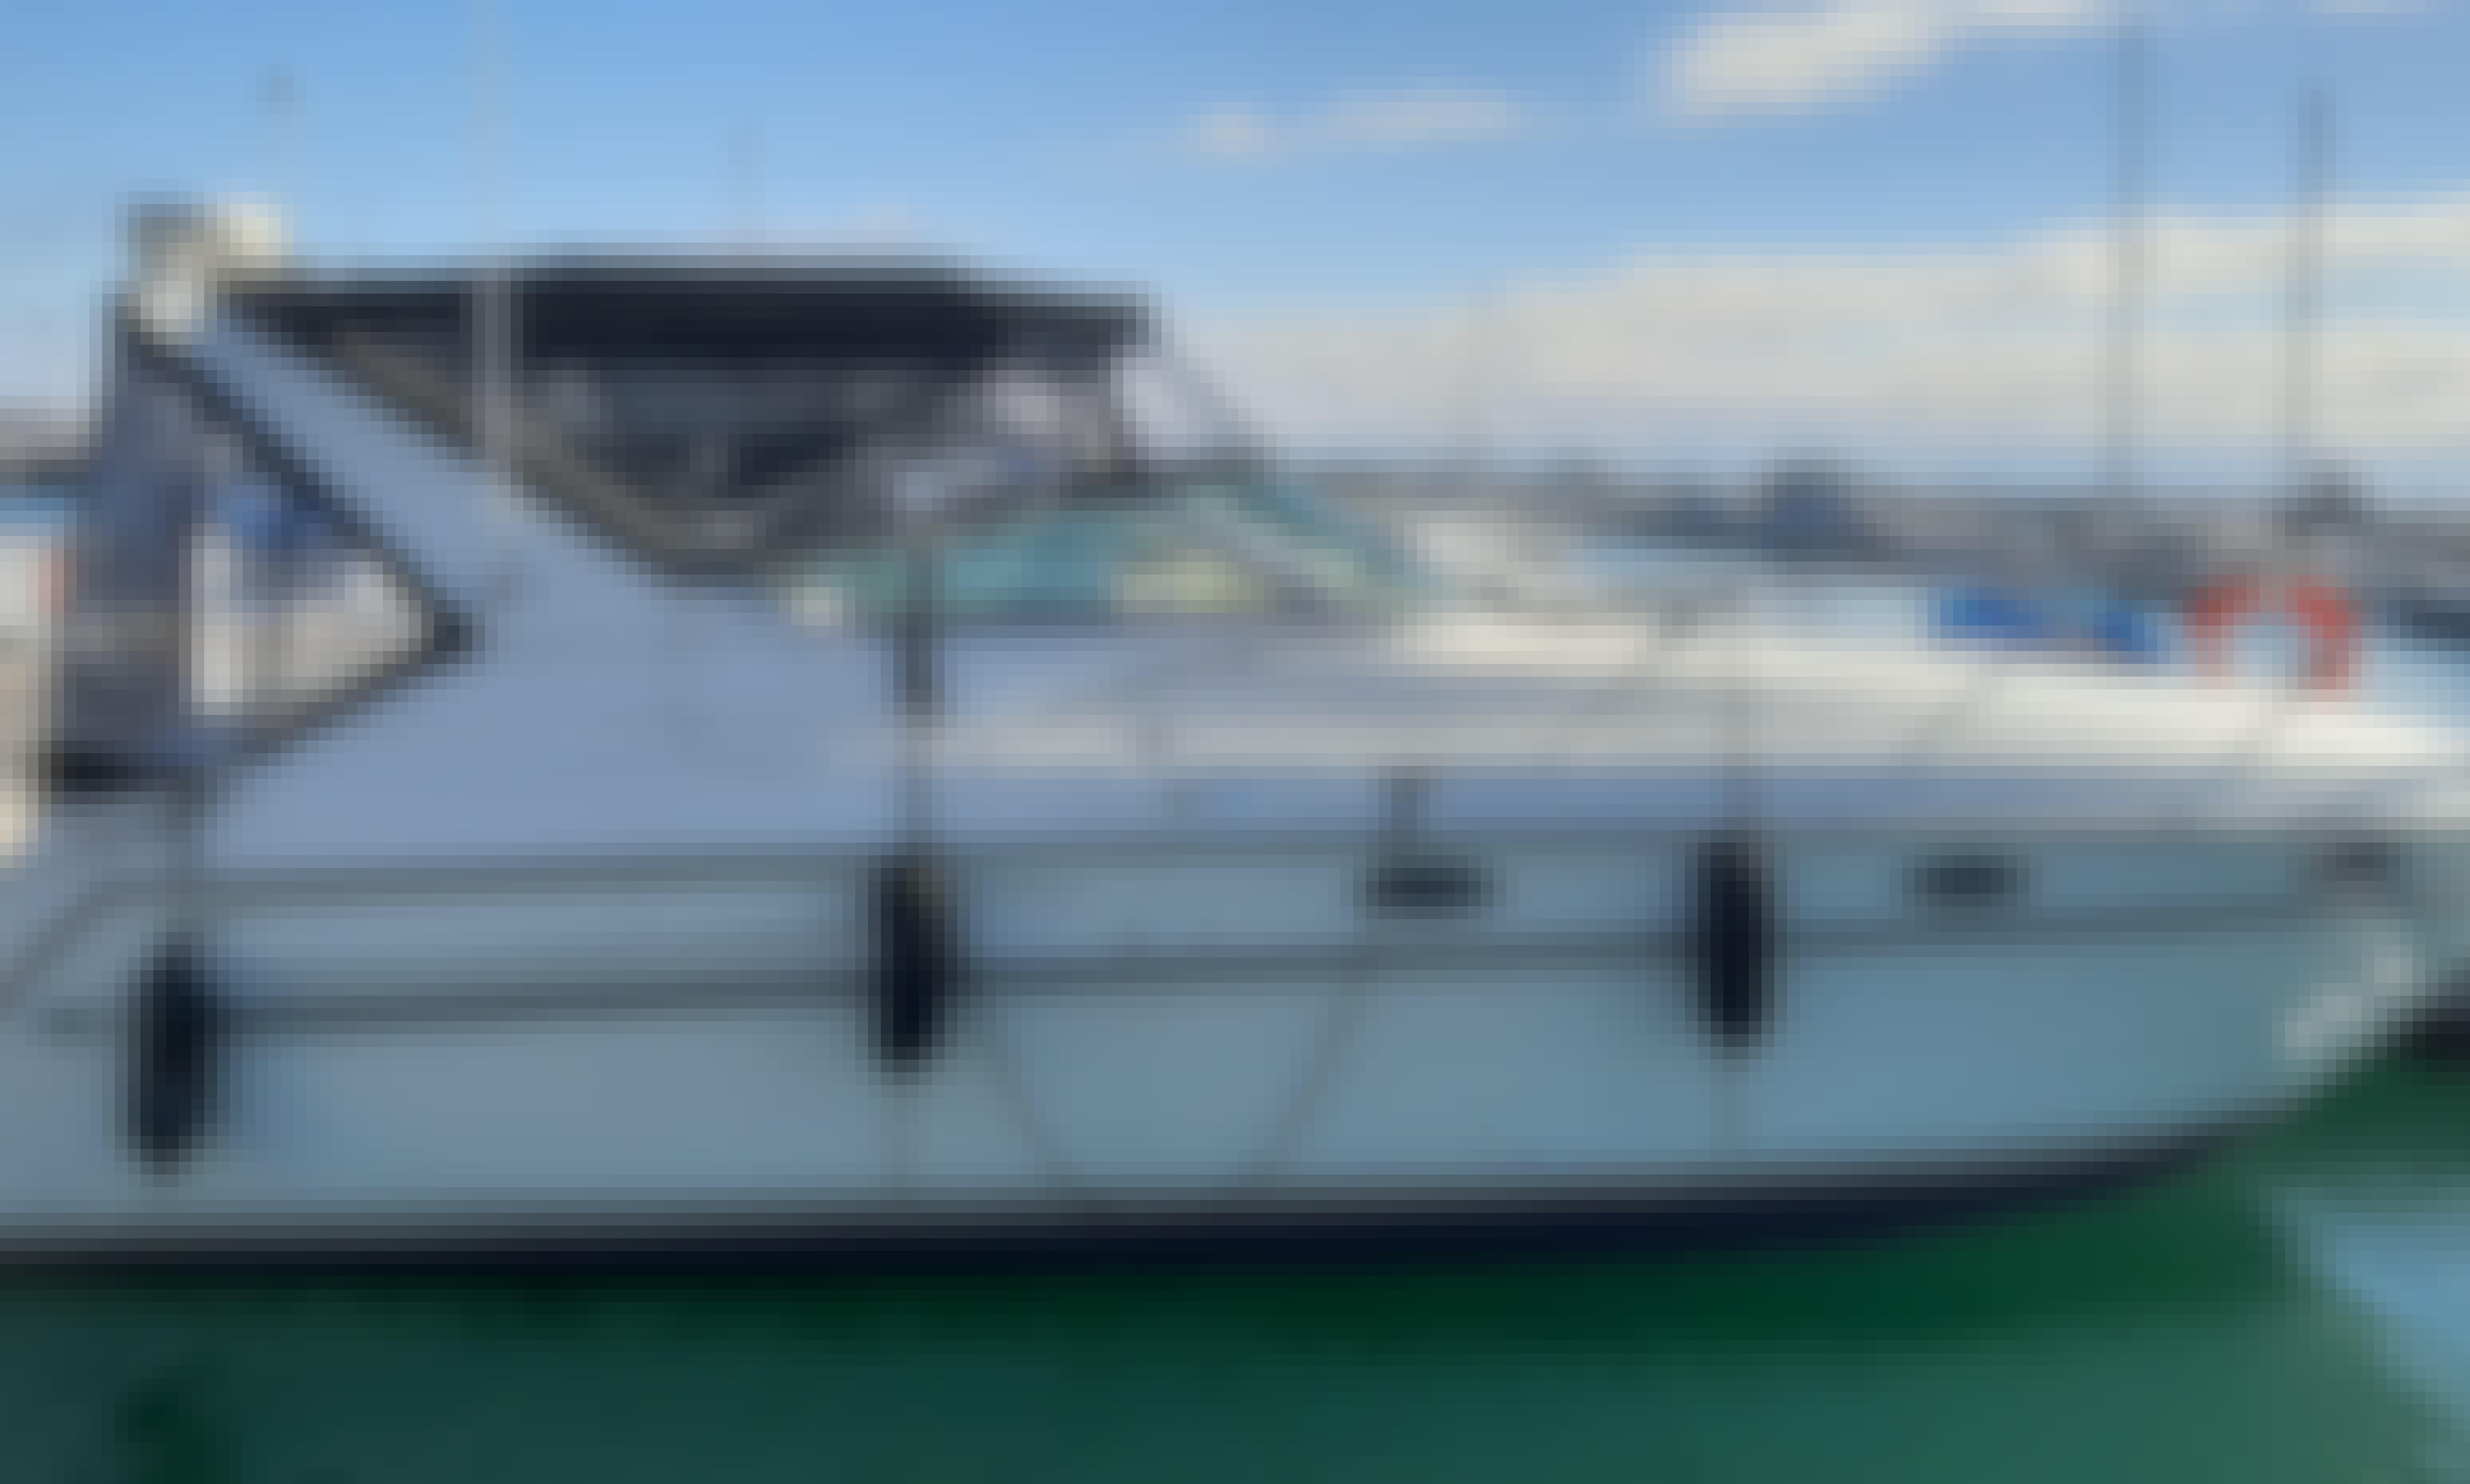 6 passenger Motor Yacht with Captain, 31st Street Harbor Chicago,